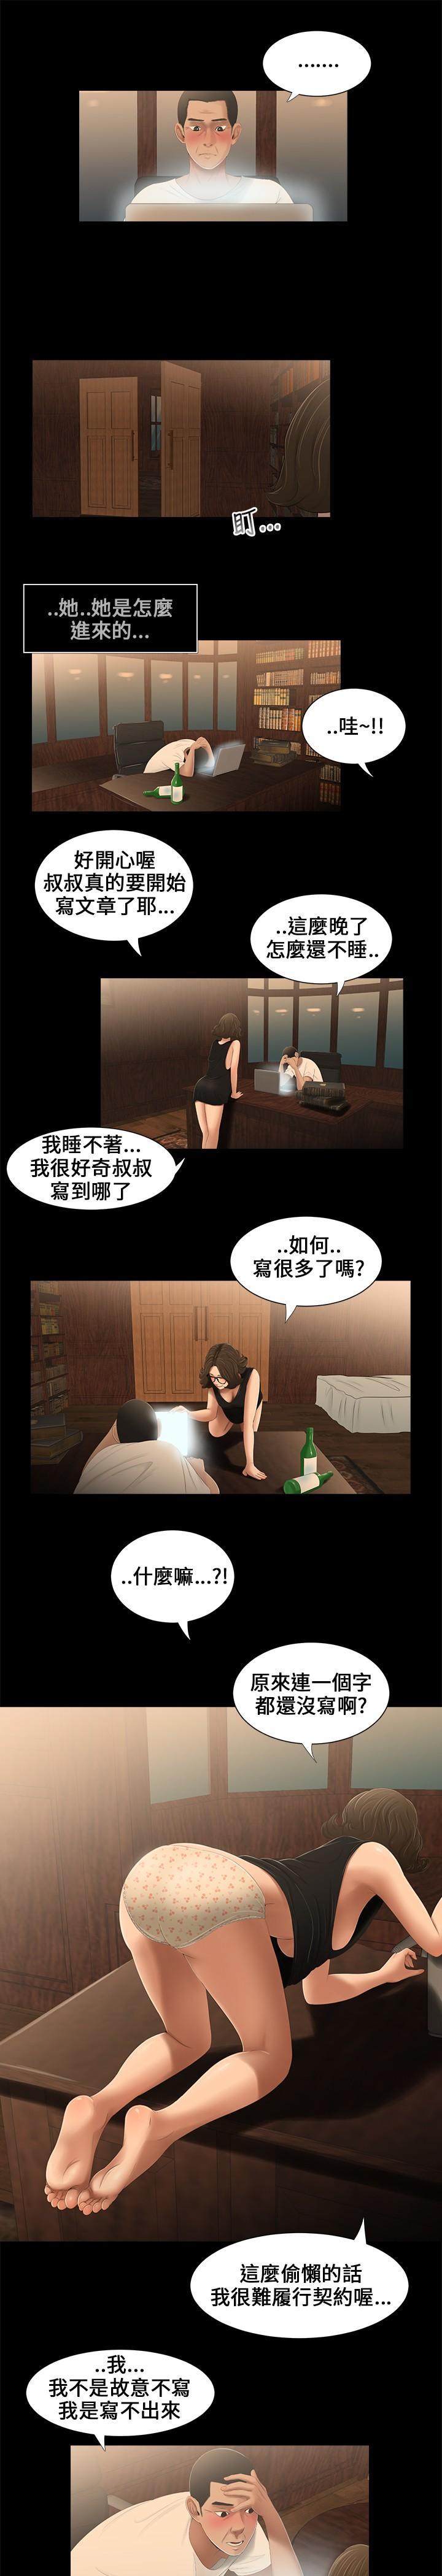 Three sisters 三姐妹Ch.13~19 (Chinese)中文 39